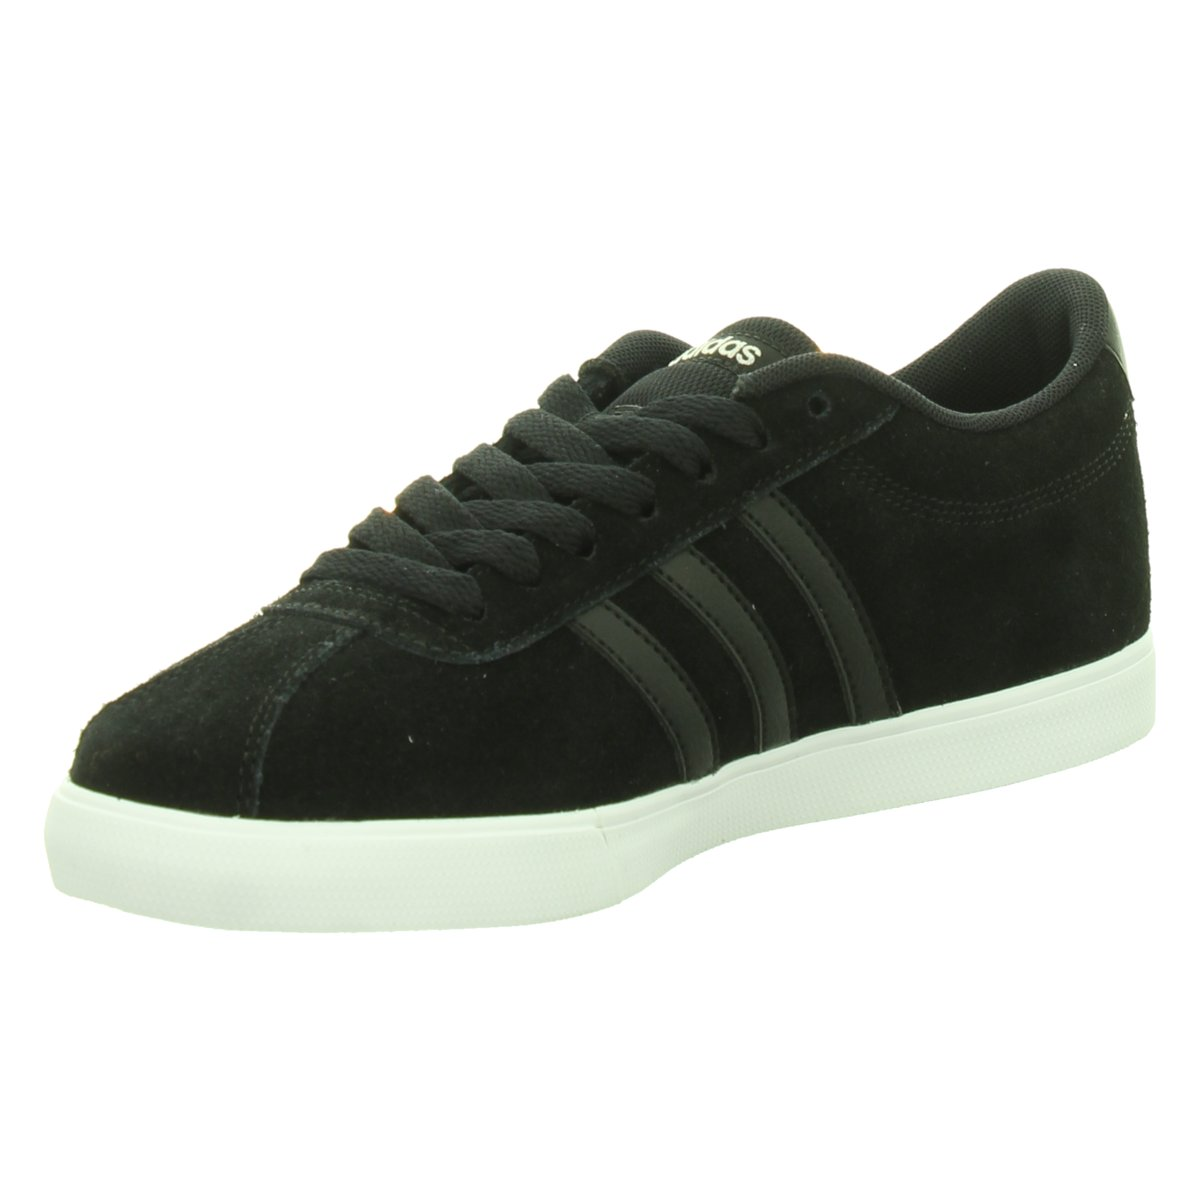 NEU adidas Damen Sneaker Sneaker Low Courtset W BB9657 schwarz 313234